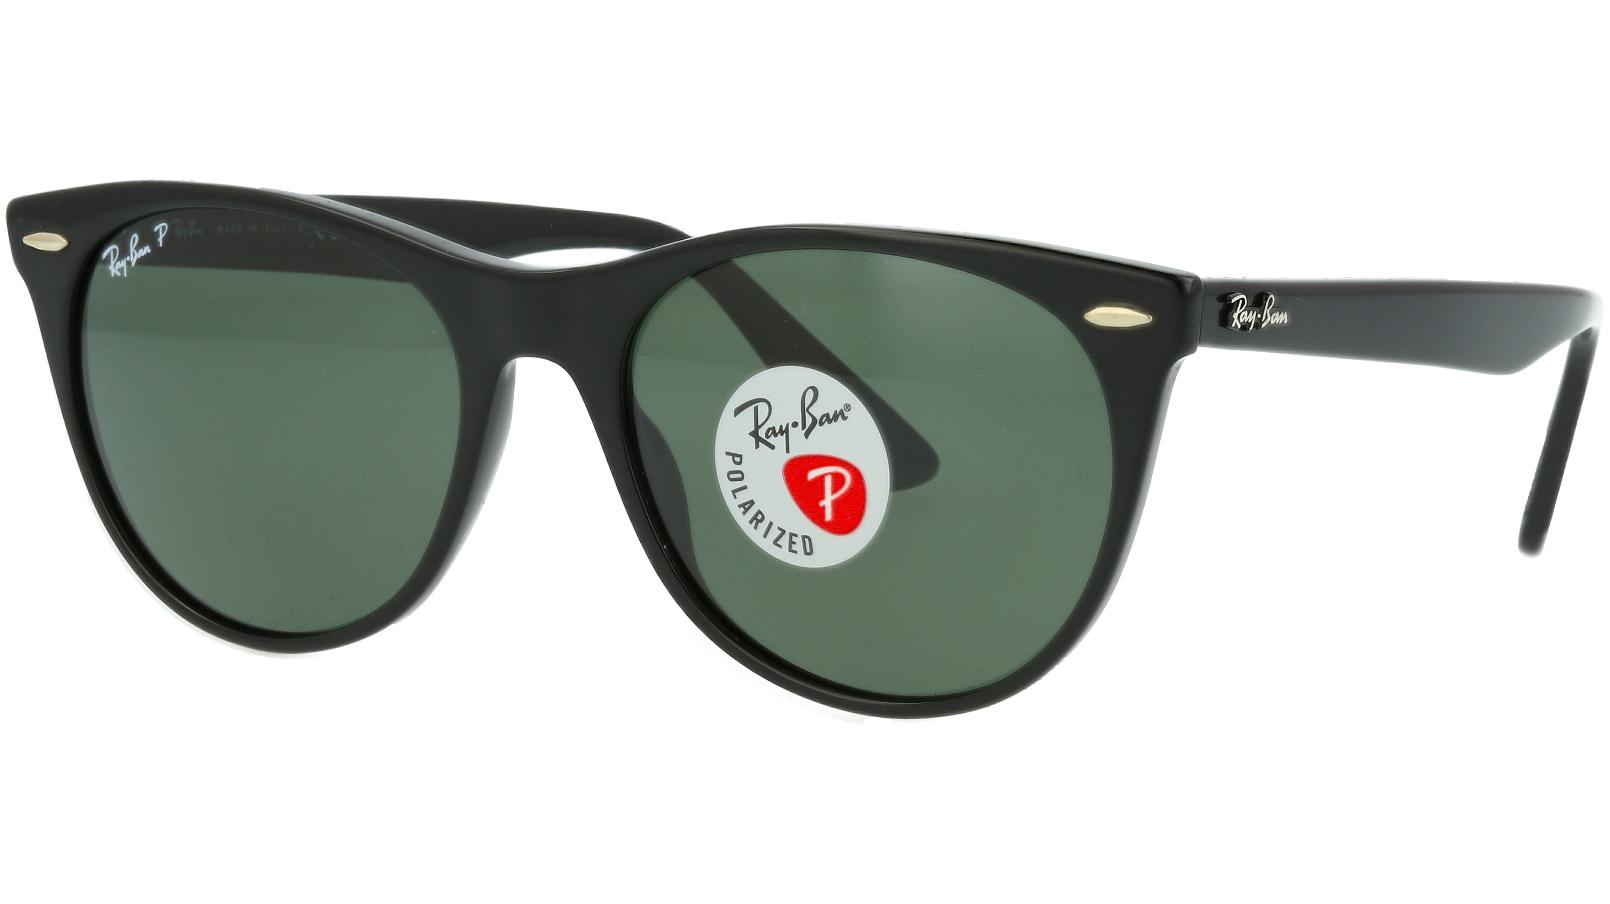 Ray-Ban RB2185 901/58 Black Polarized  Sunglasses